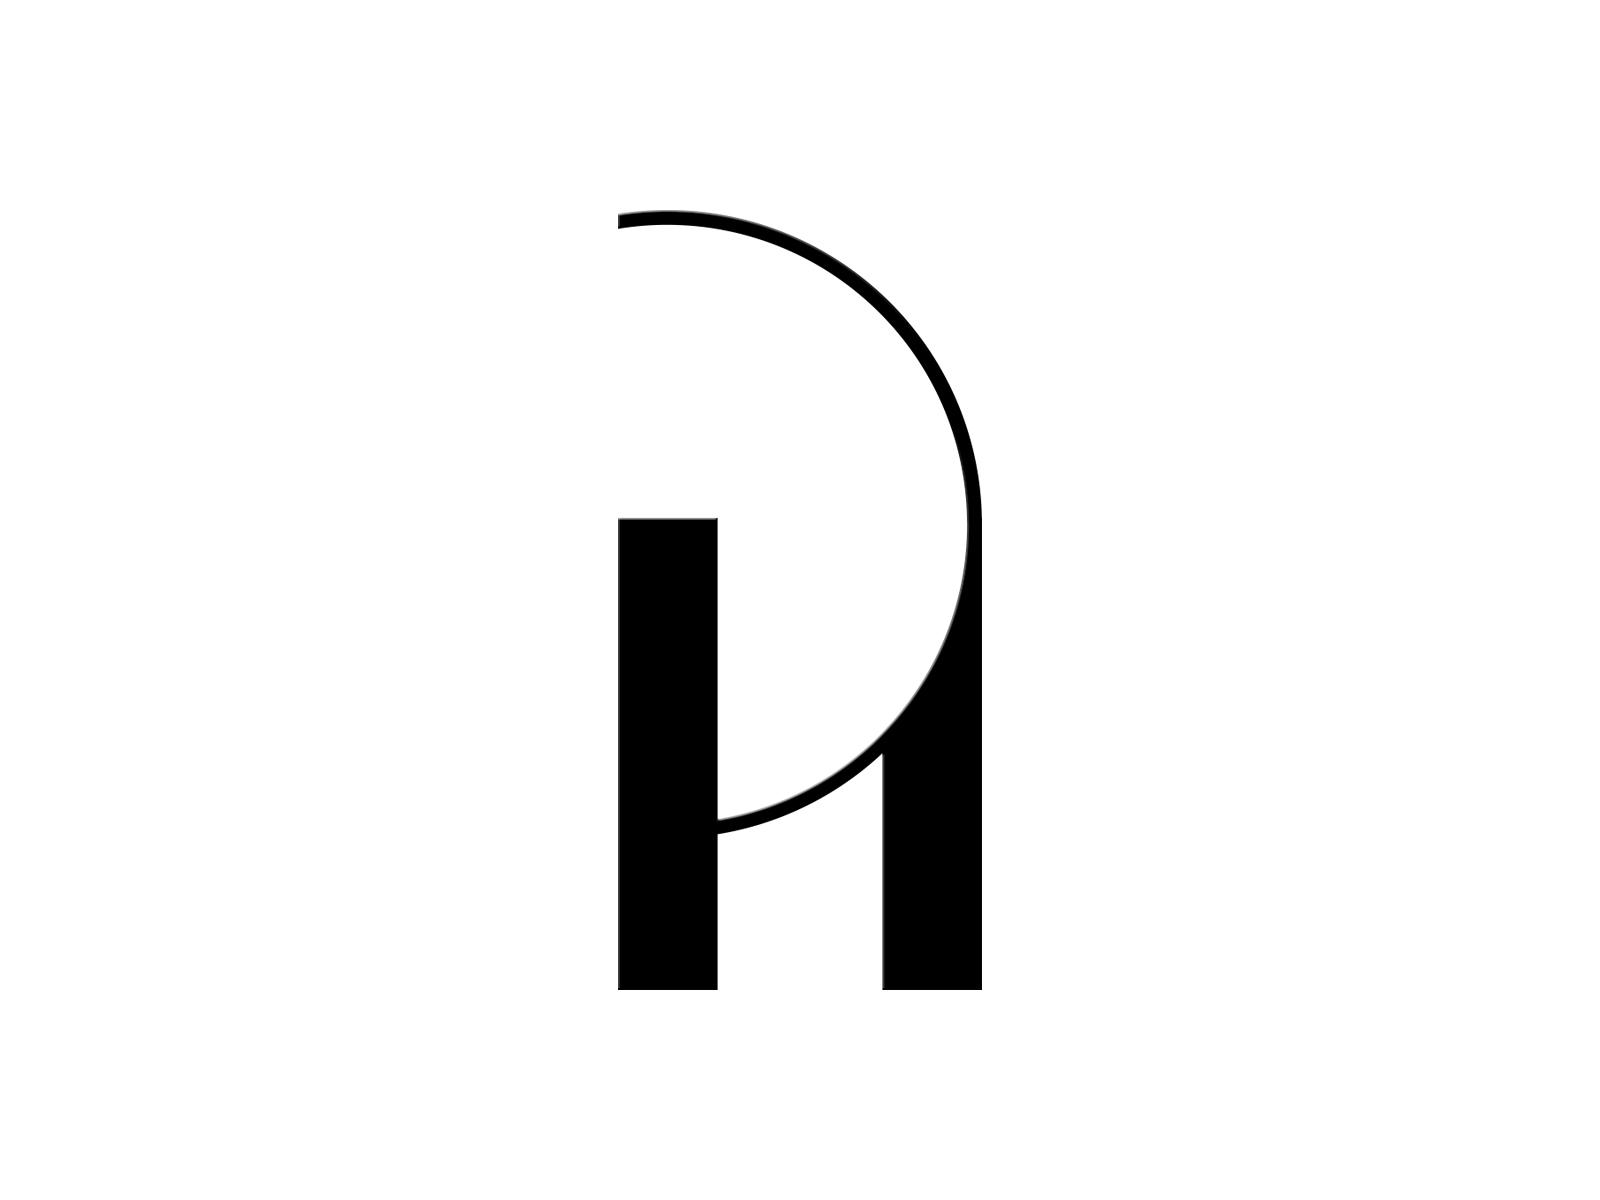 Ph Monogram By Andrijana Miladinovic On Dribbble